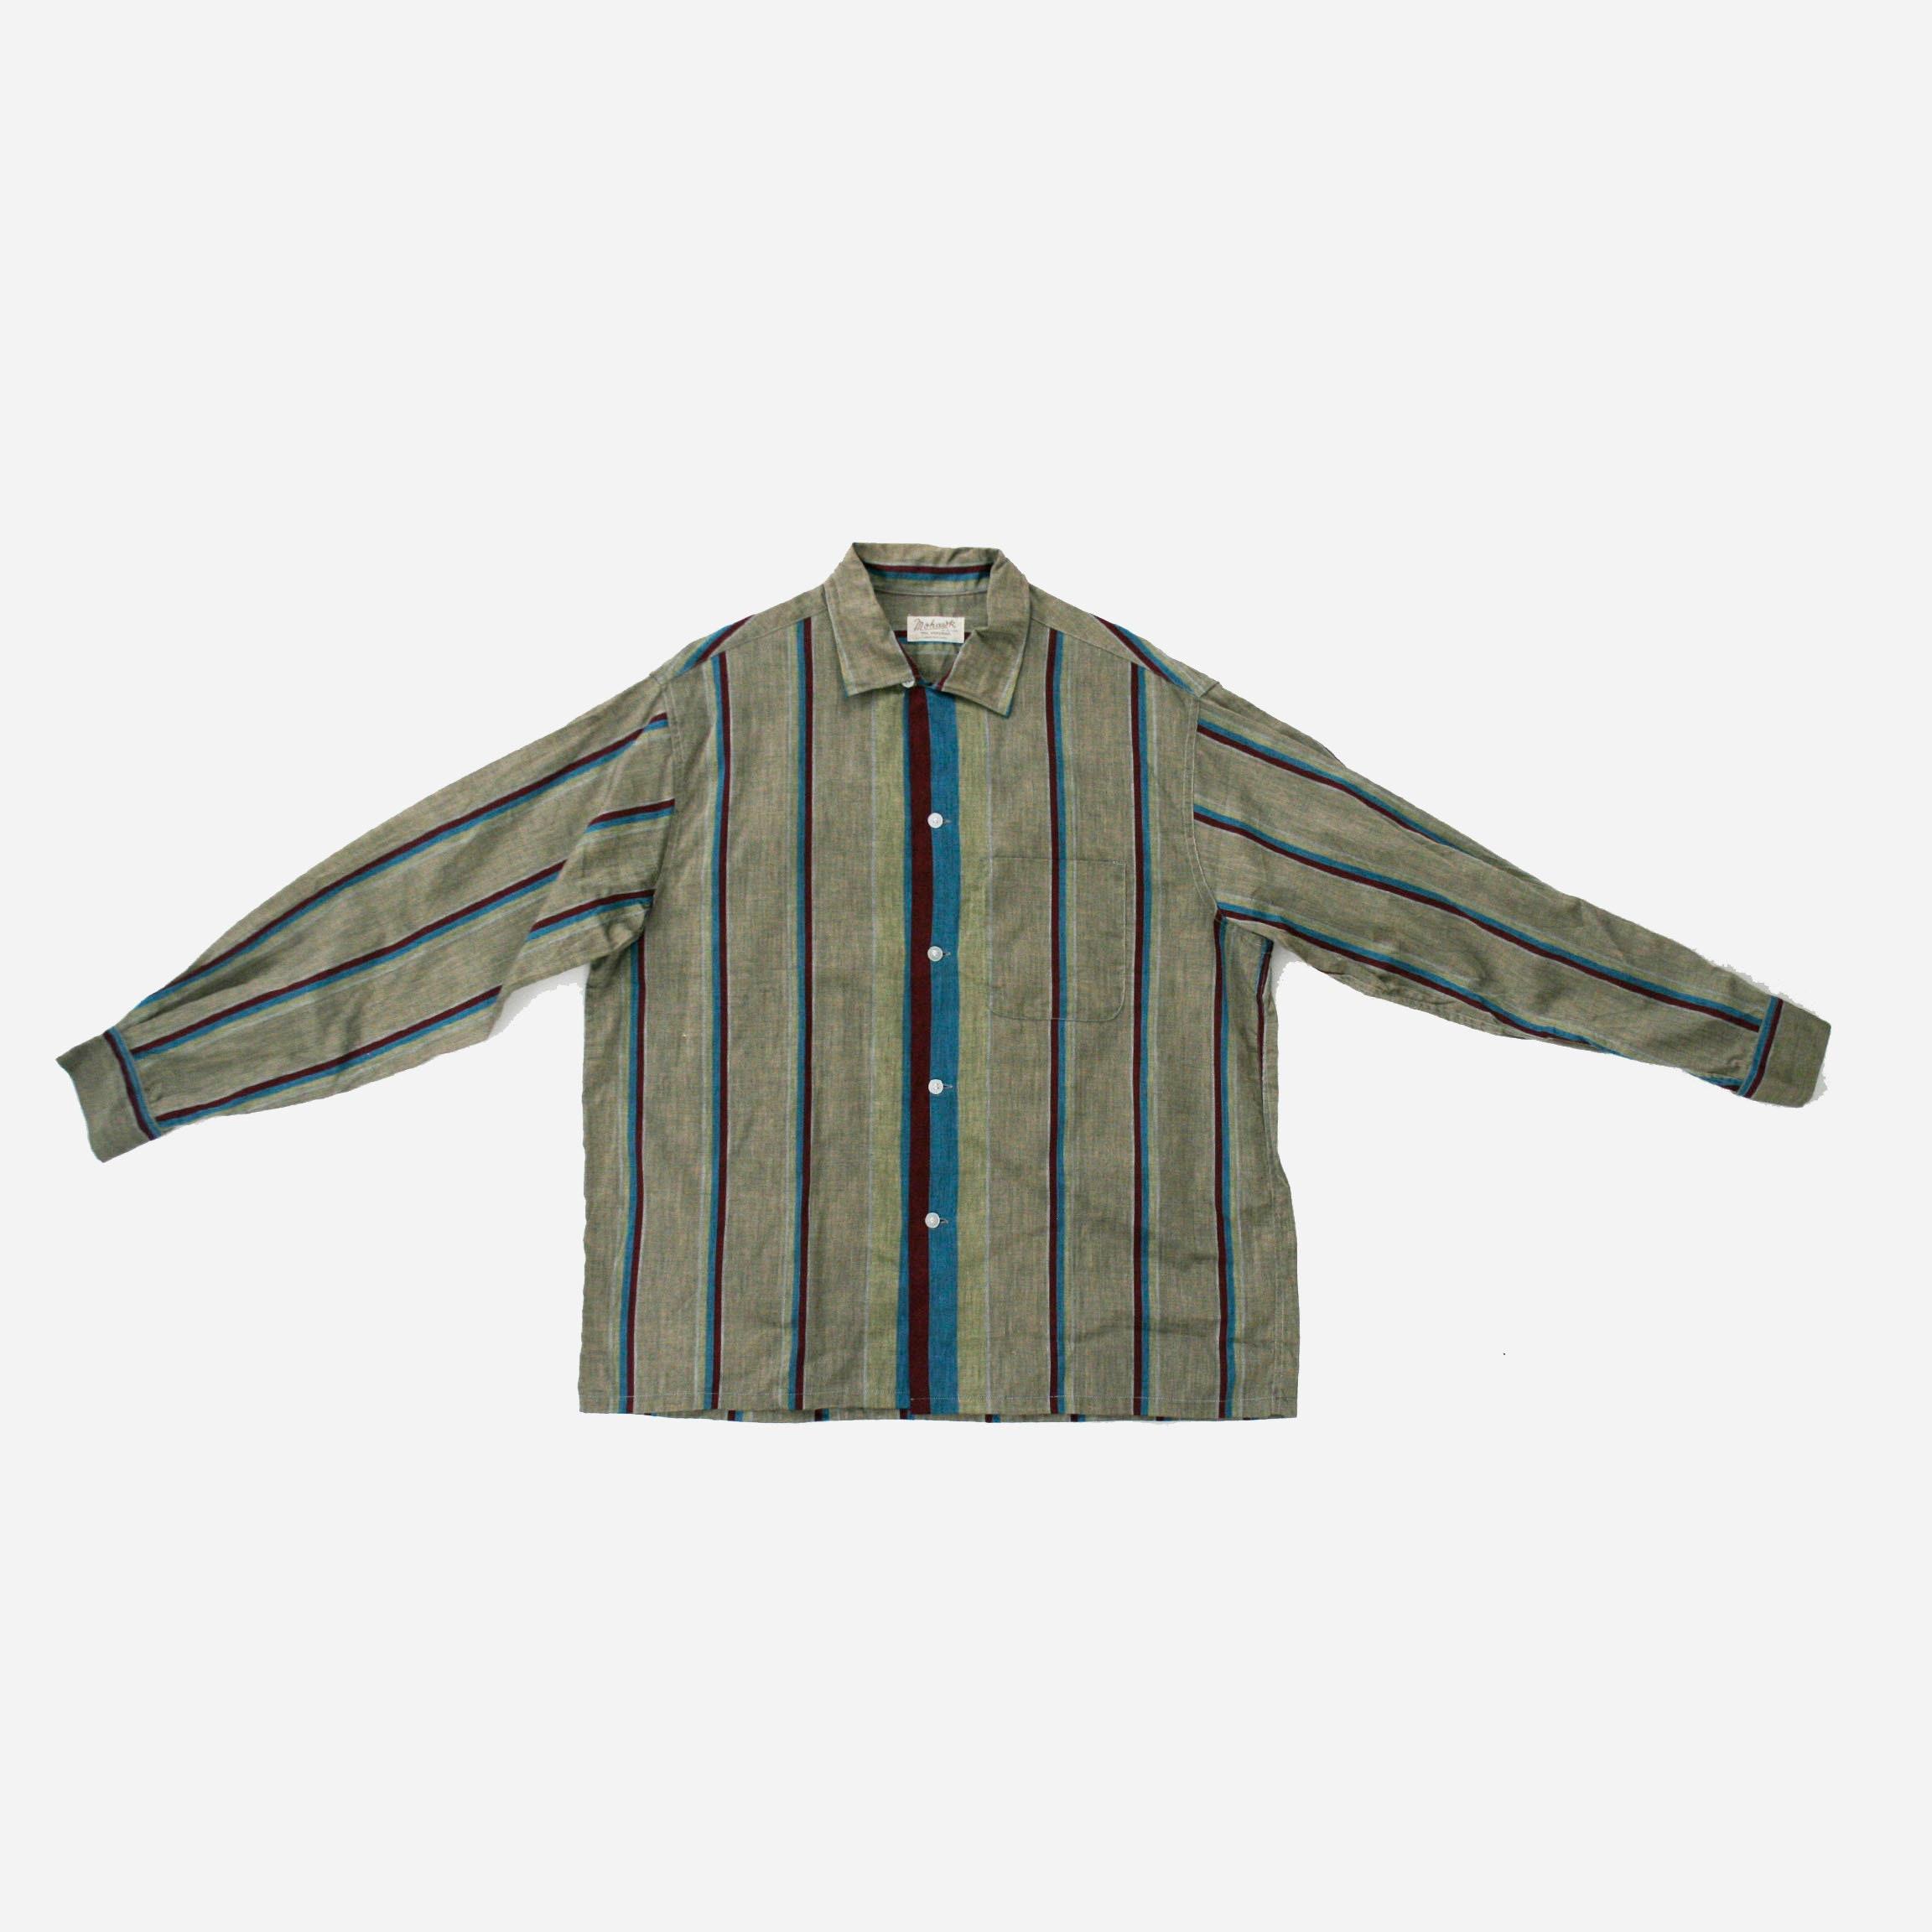 1940s Mens Ties | Wide Ties & Painted Ties Vintage 1940s Mens Stripe Mohawk Button Down - Gray Burgundy Blue Loop Collar Shirt Long Sleeve Print Atomic Xxl Deadstock $0.00 AT vintagedancer.com